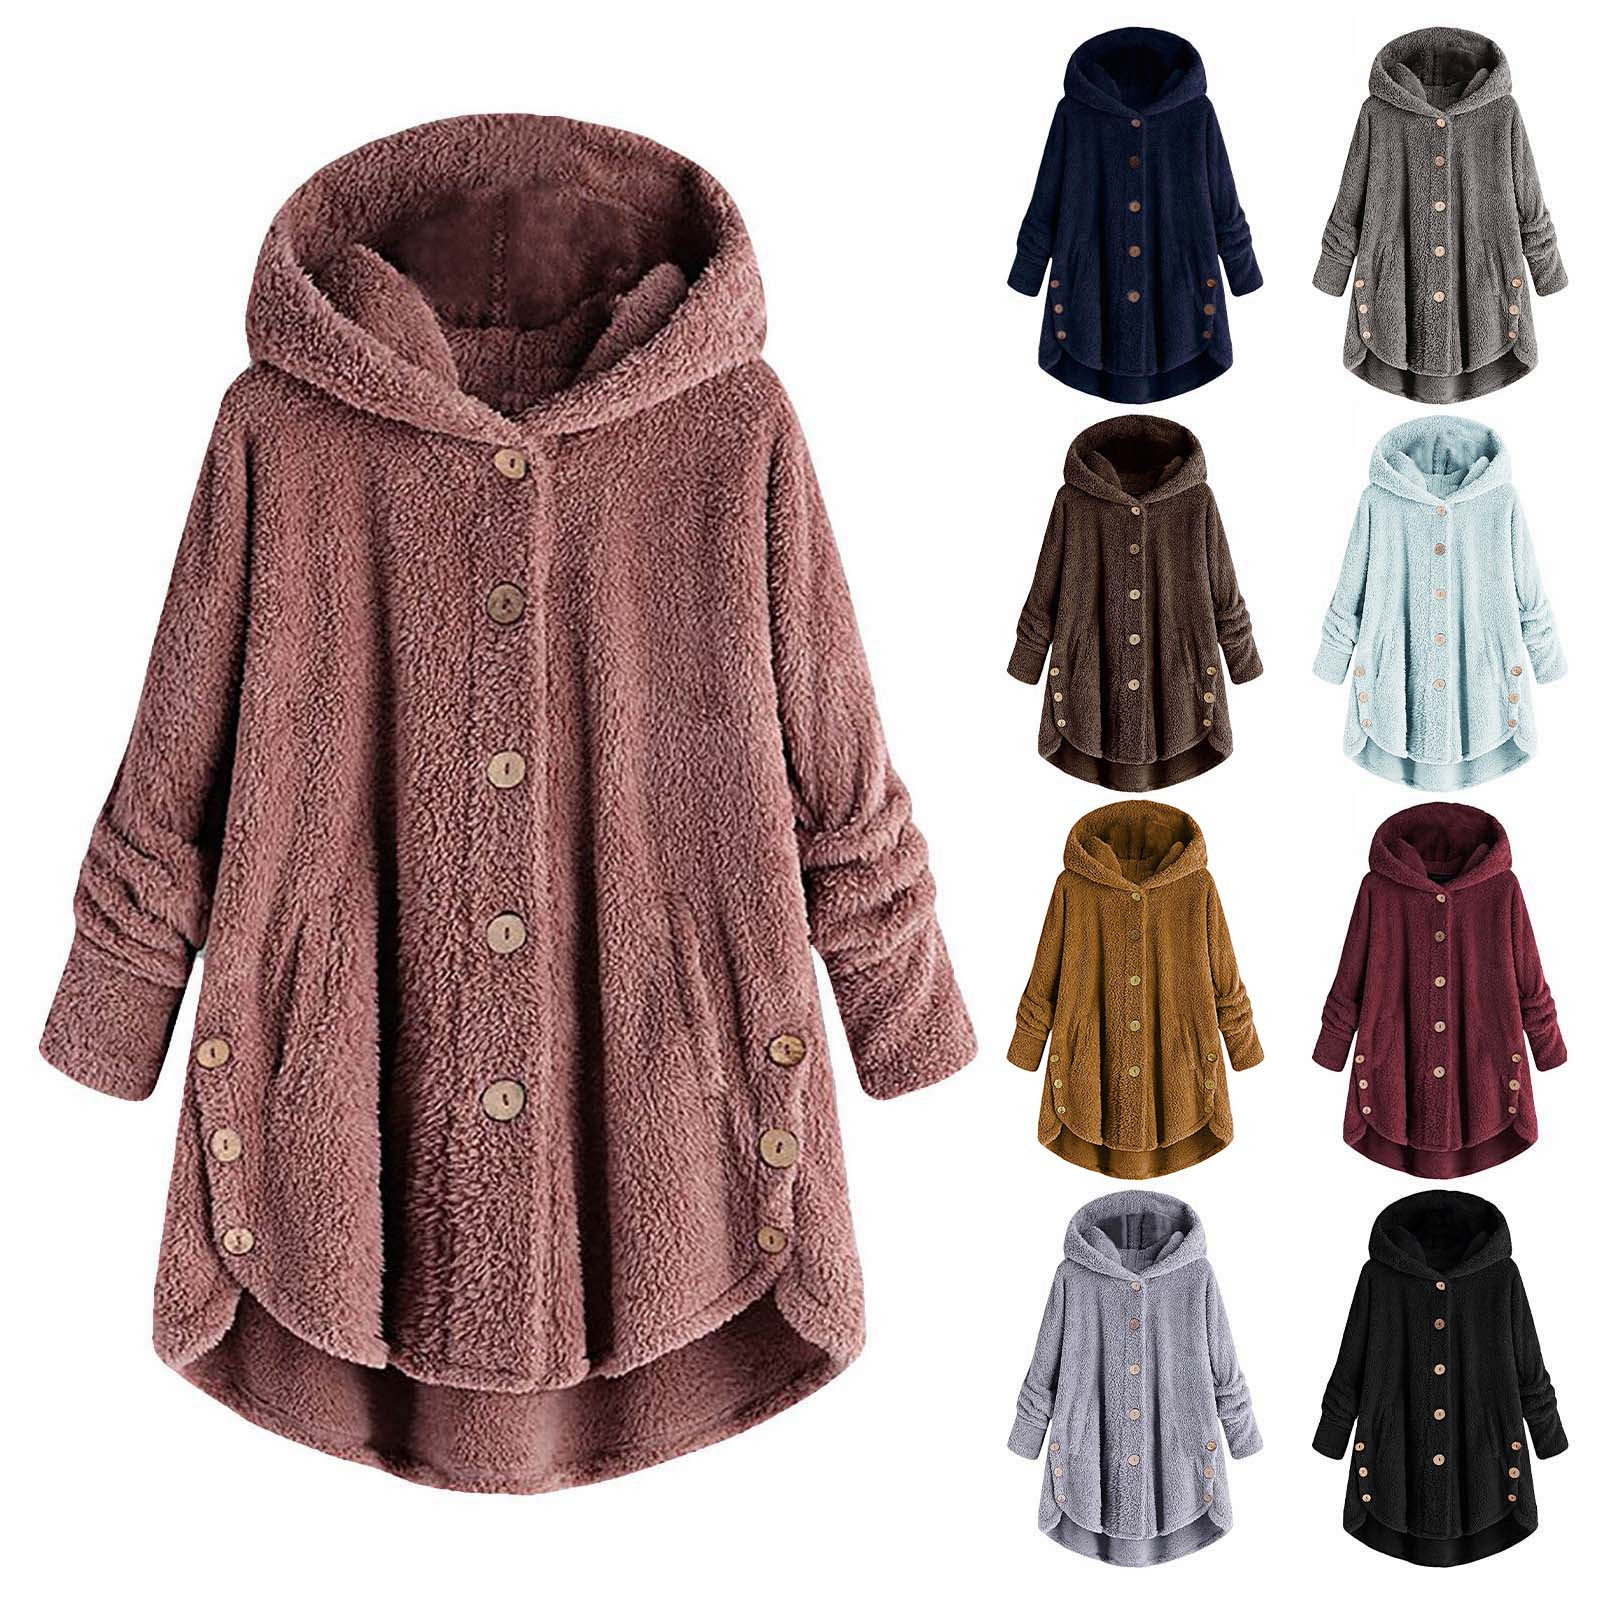 40# Plus Size Fashion Plush Sweater Casual Winter Warm Hooded Coat Ladies Female Streetwear Women Long Sleeve Blusas Jumper